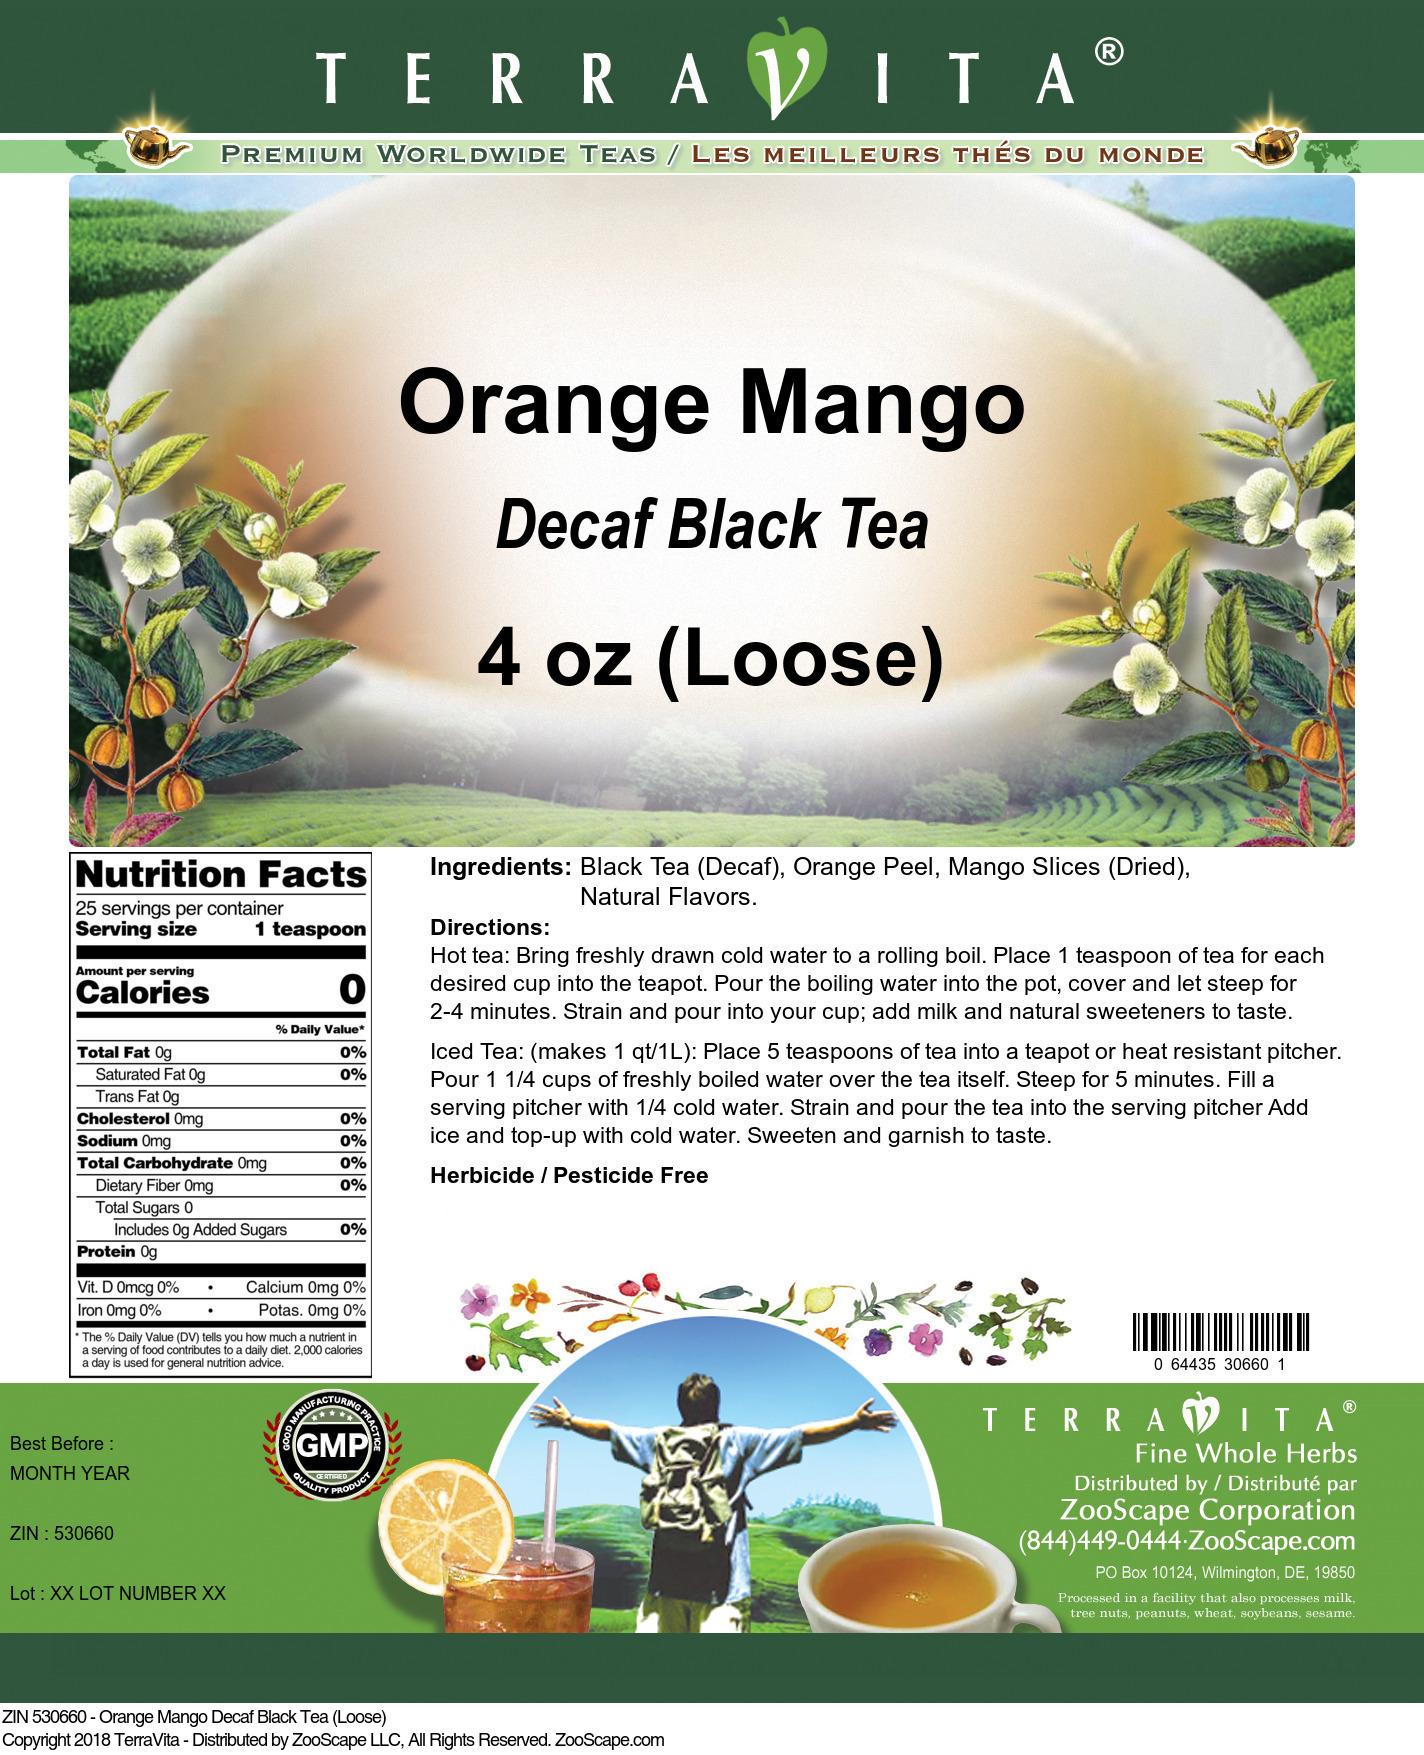 Orange Mango Decaf Black Tea (Loose)